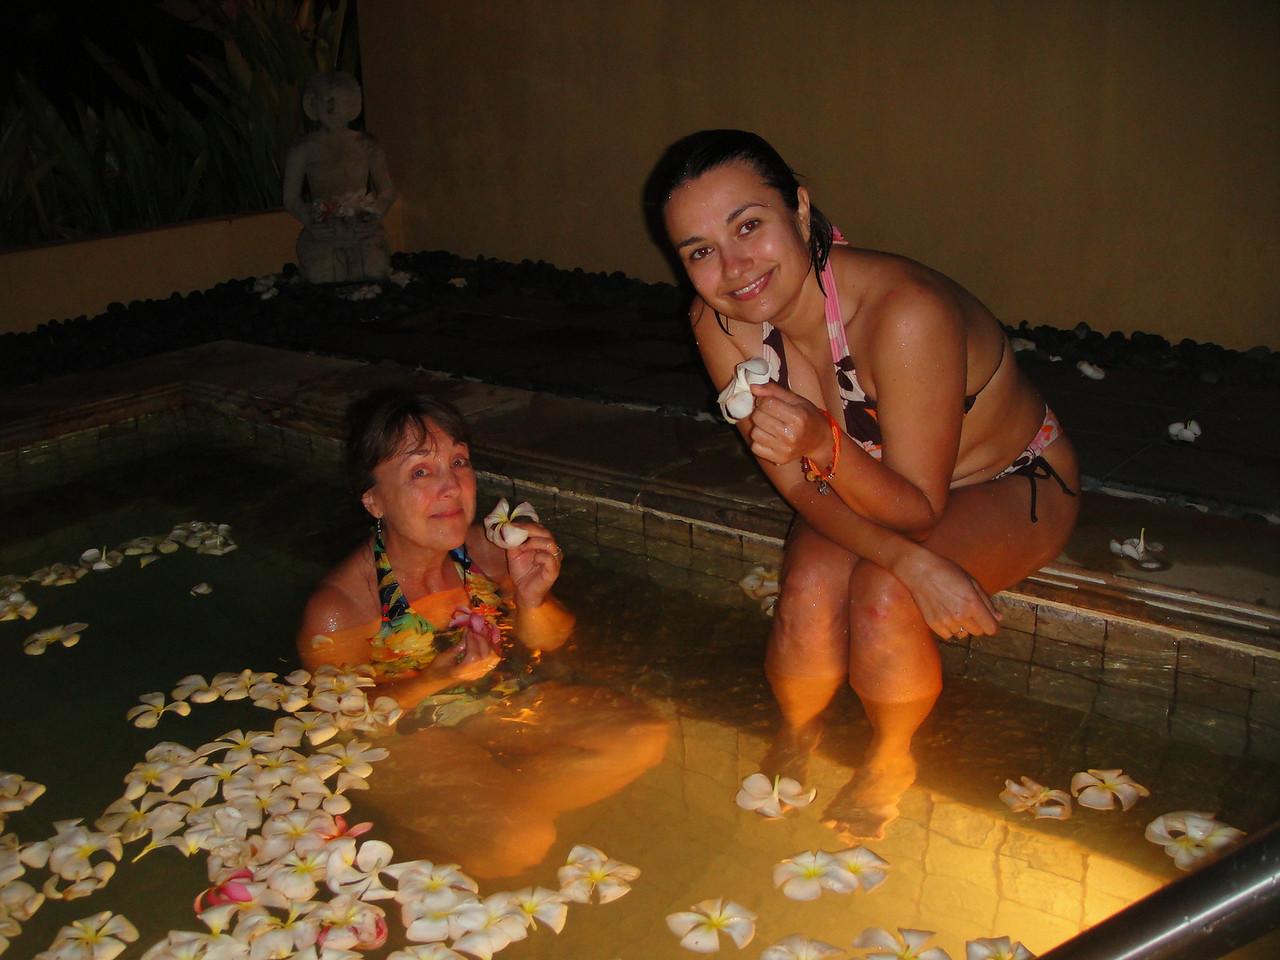 BeverLi and Olga Shakalova at the hot plumeria pool, Mandi's Spa, Marianas Resort, Saipan